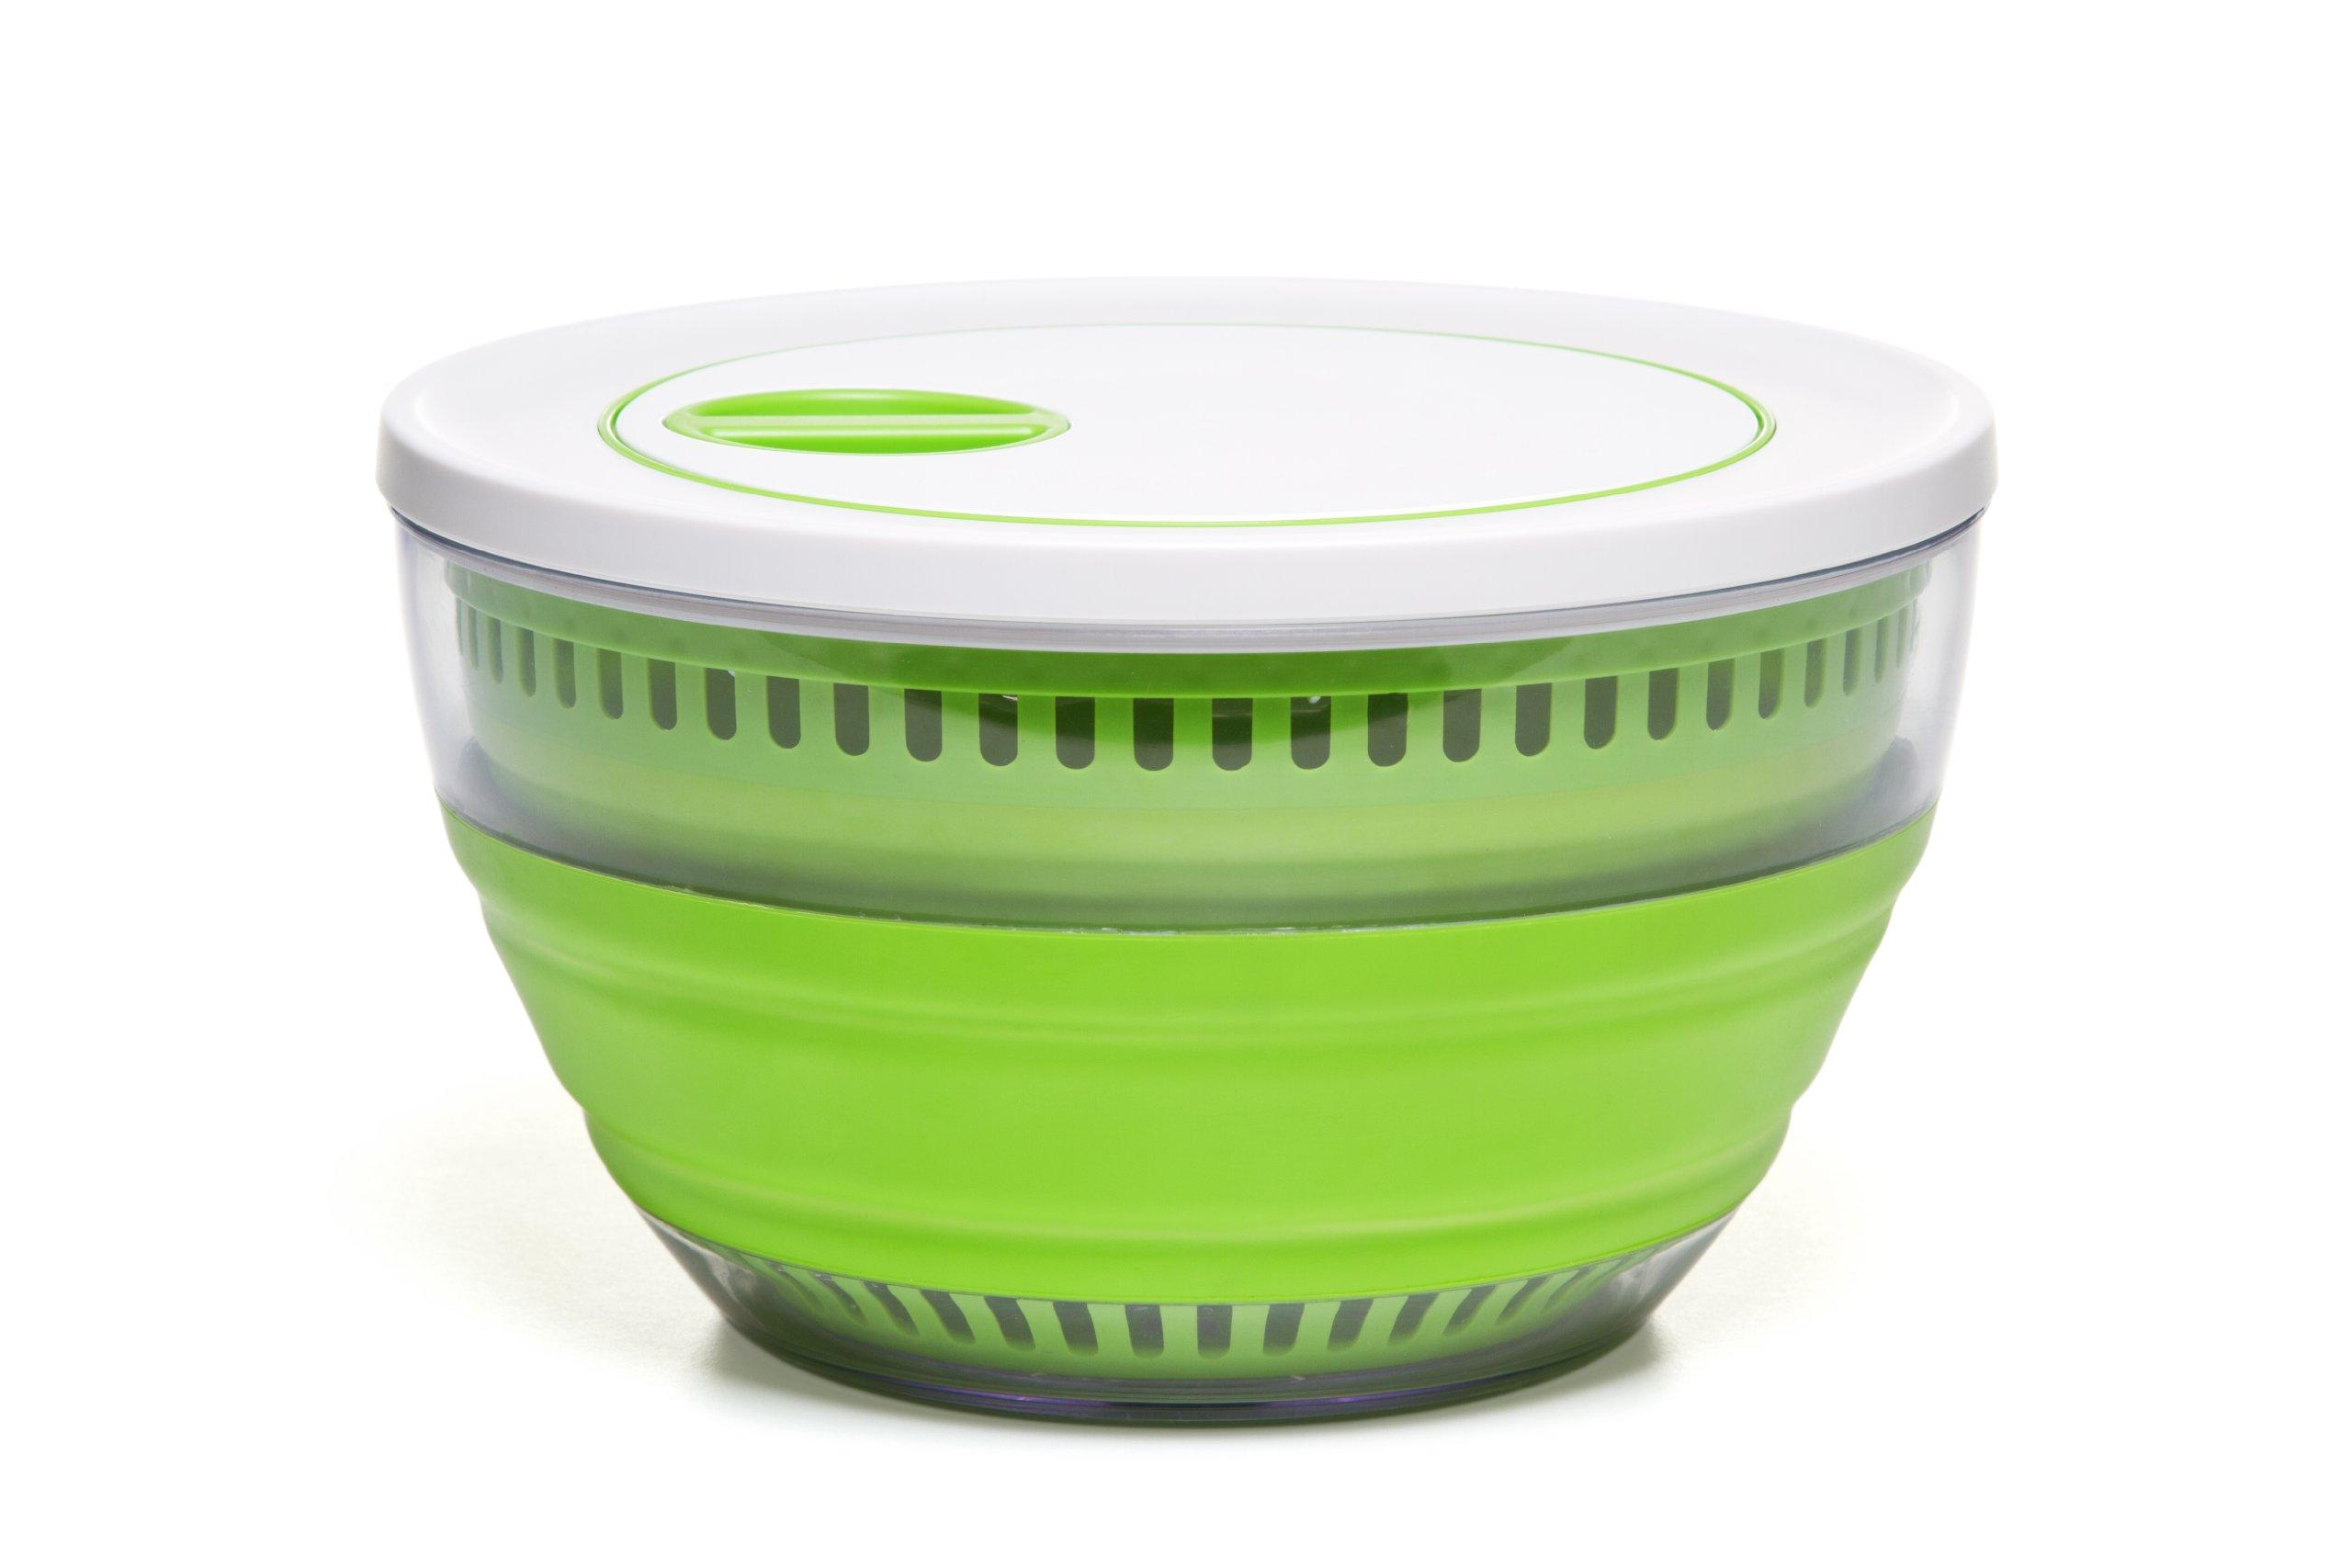 Prepworks by Progressive Collapsible Salad Spinner - 4 Quart by Prepworks from Progressive